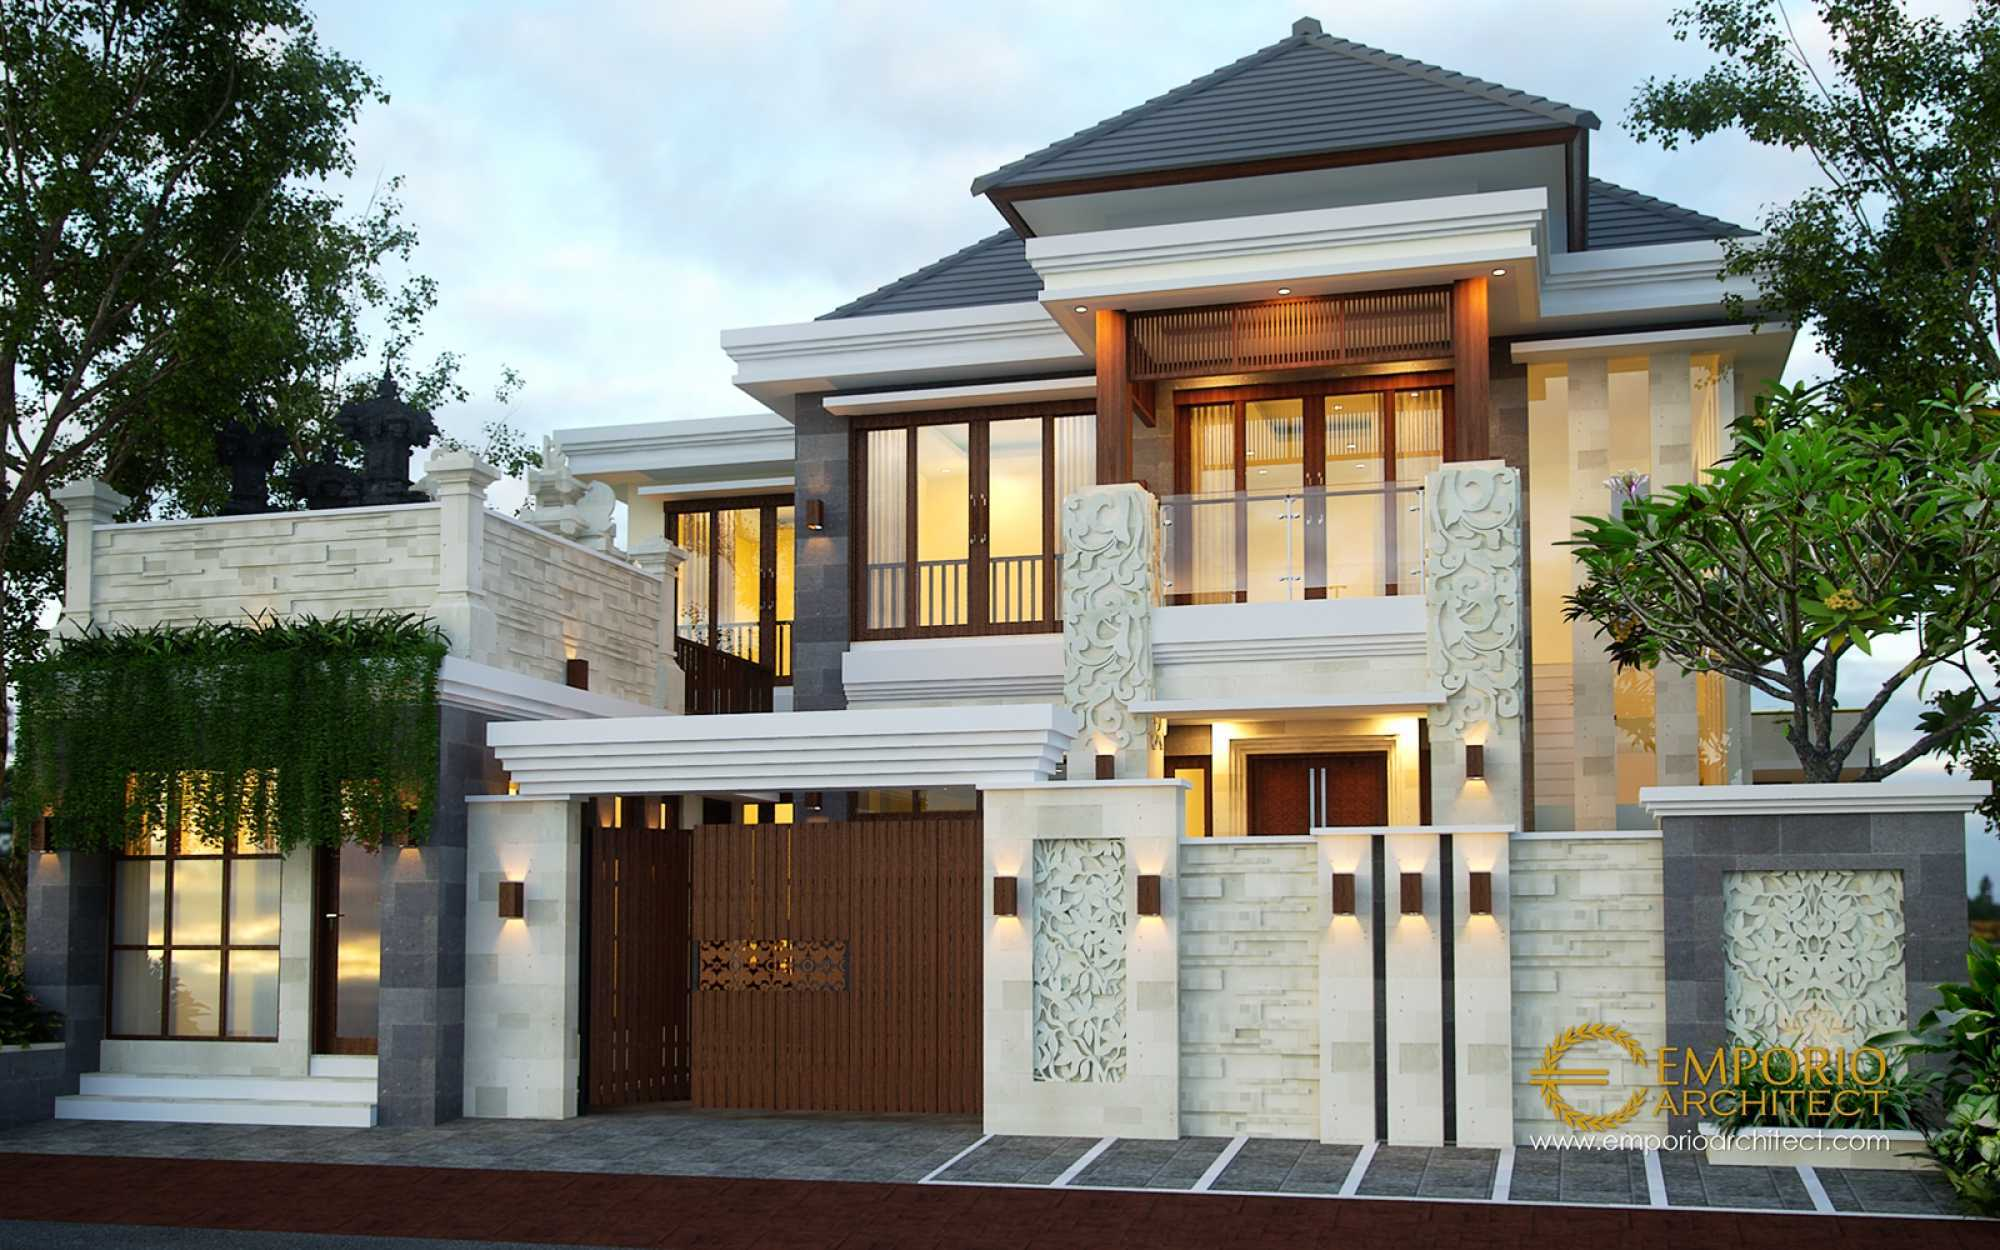 Emporio Architect Desain Rumah Villa Bali Tropis 419 @ Denpasar, Bali Kota Denpasar, Bali, Indonesia Kota Denpasar, Bali, Indonesia Emporio-Architect-Desain-Rumah-Villa-Bali-Tropis-419-Denpasar-Bali Tropical 77400